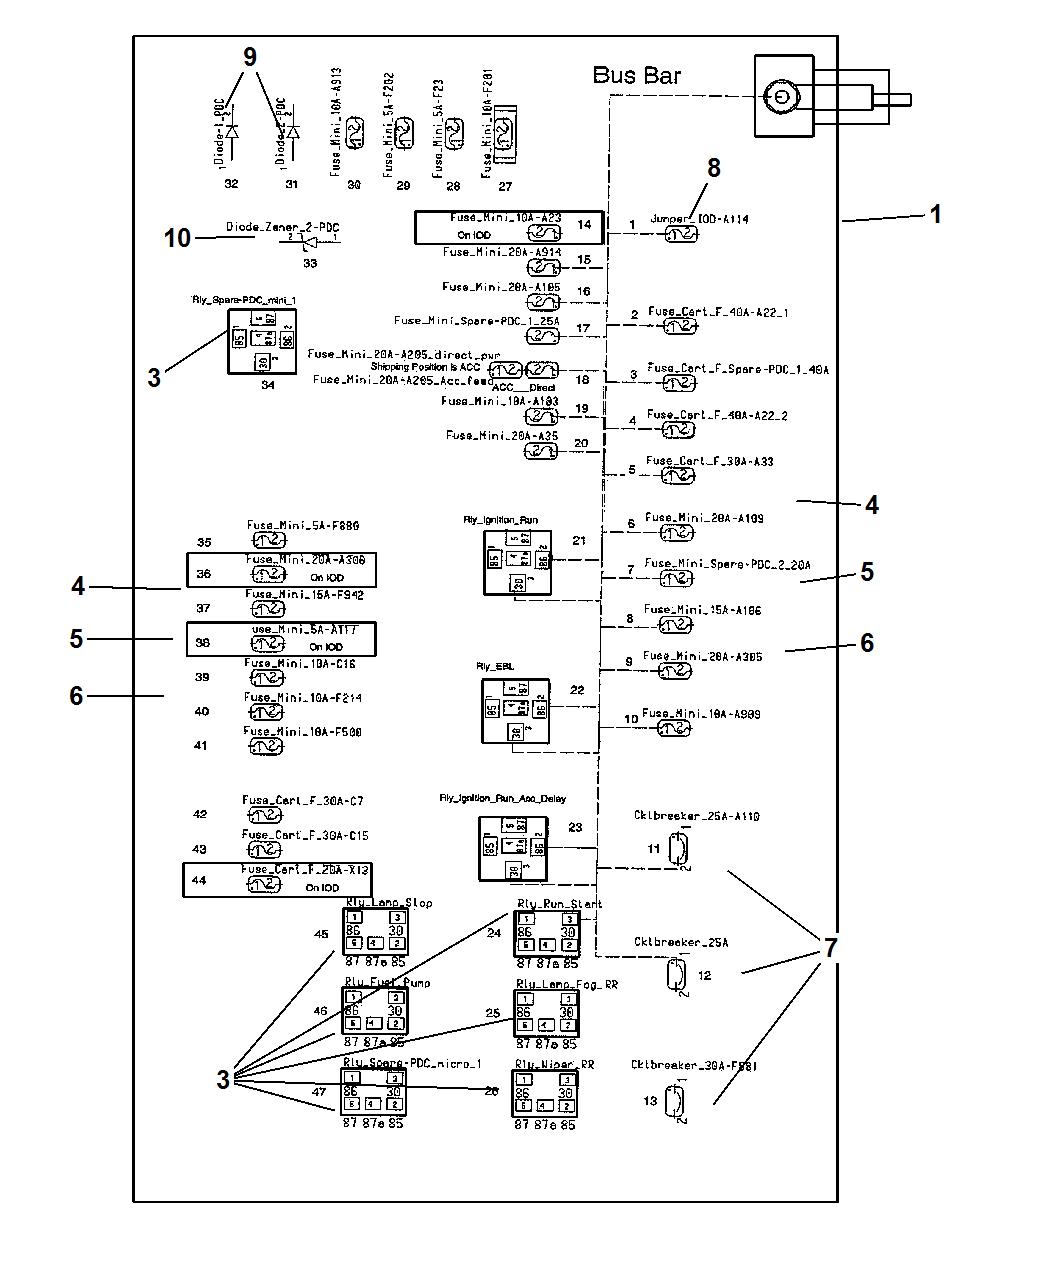 06 Charger Fuse Box Diagram Alternator Idiot Light Wiring Diagram Begeboy Wiring Diagram Source